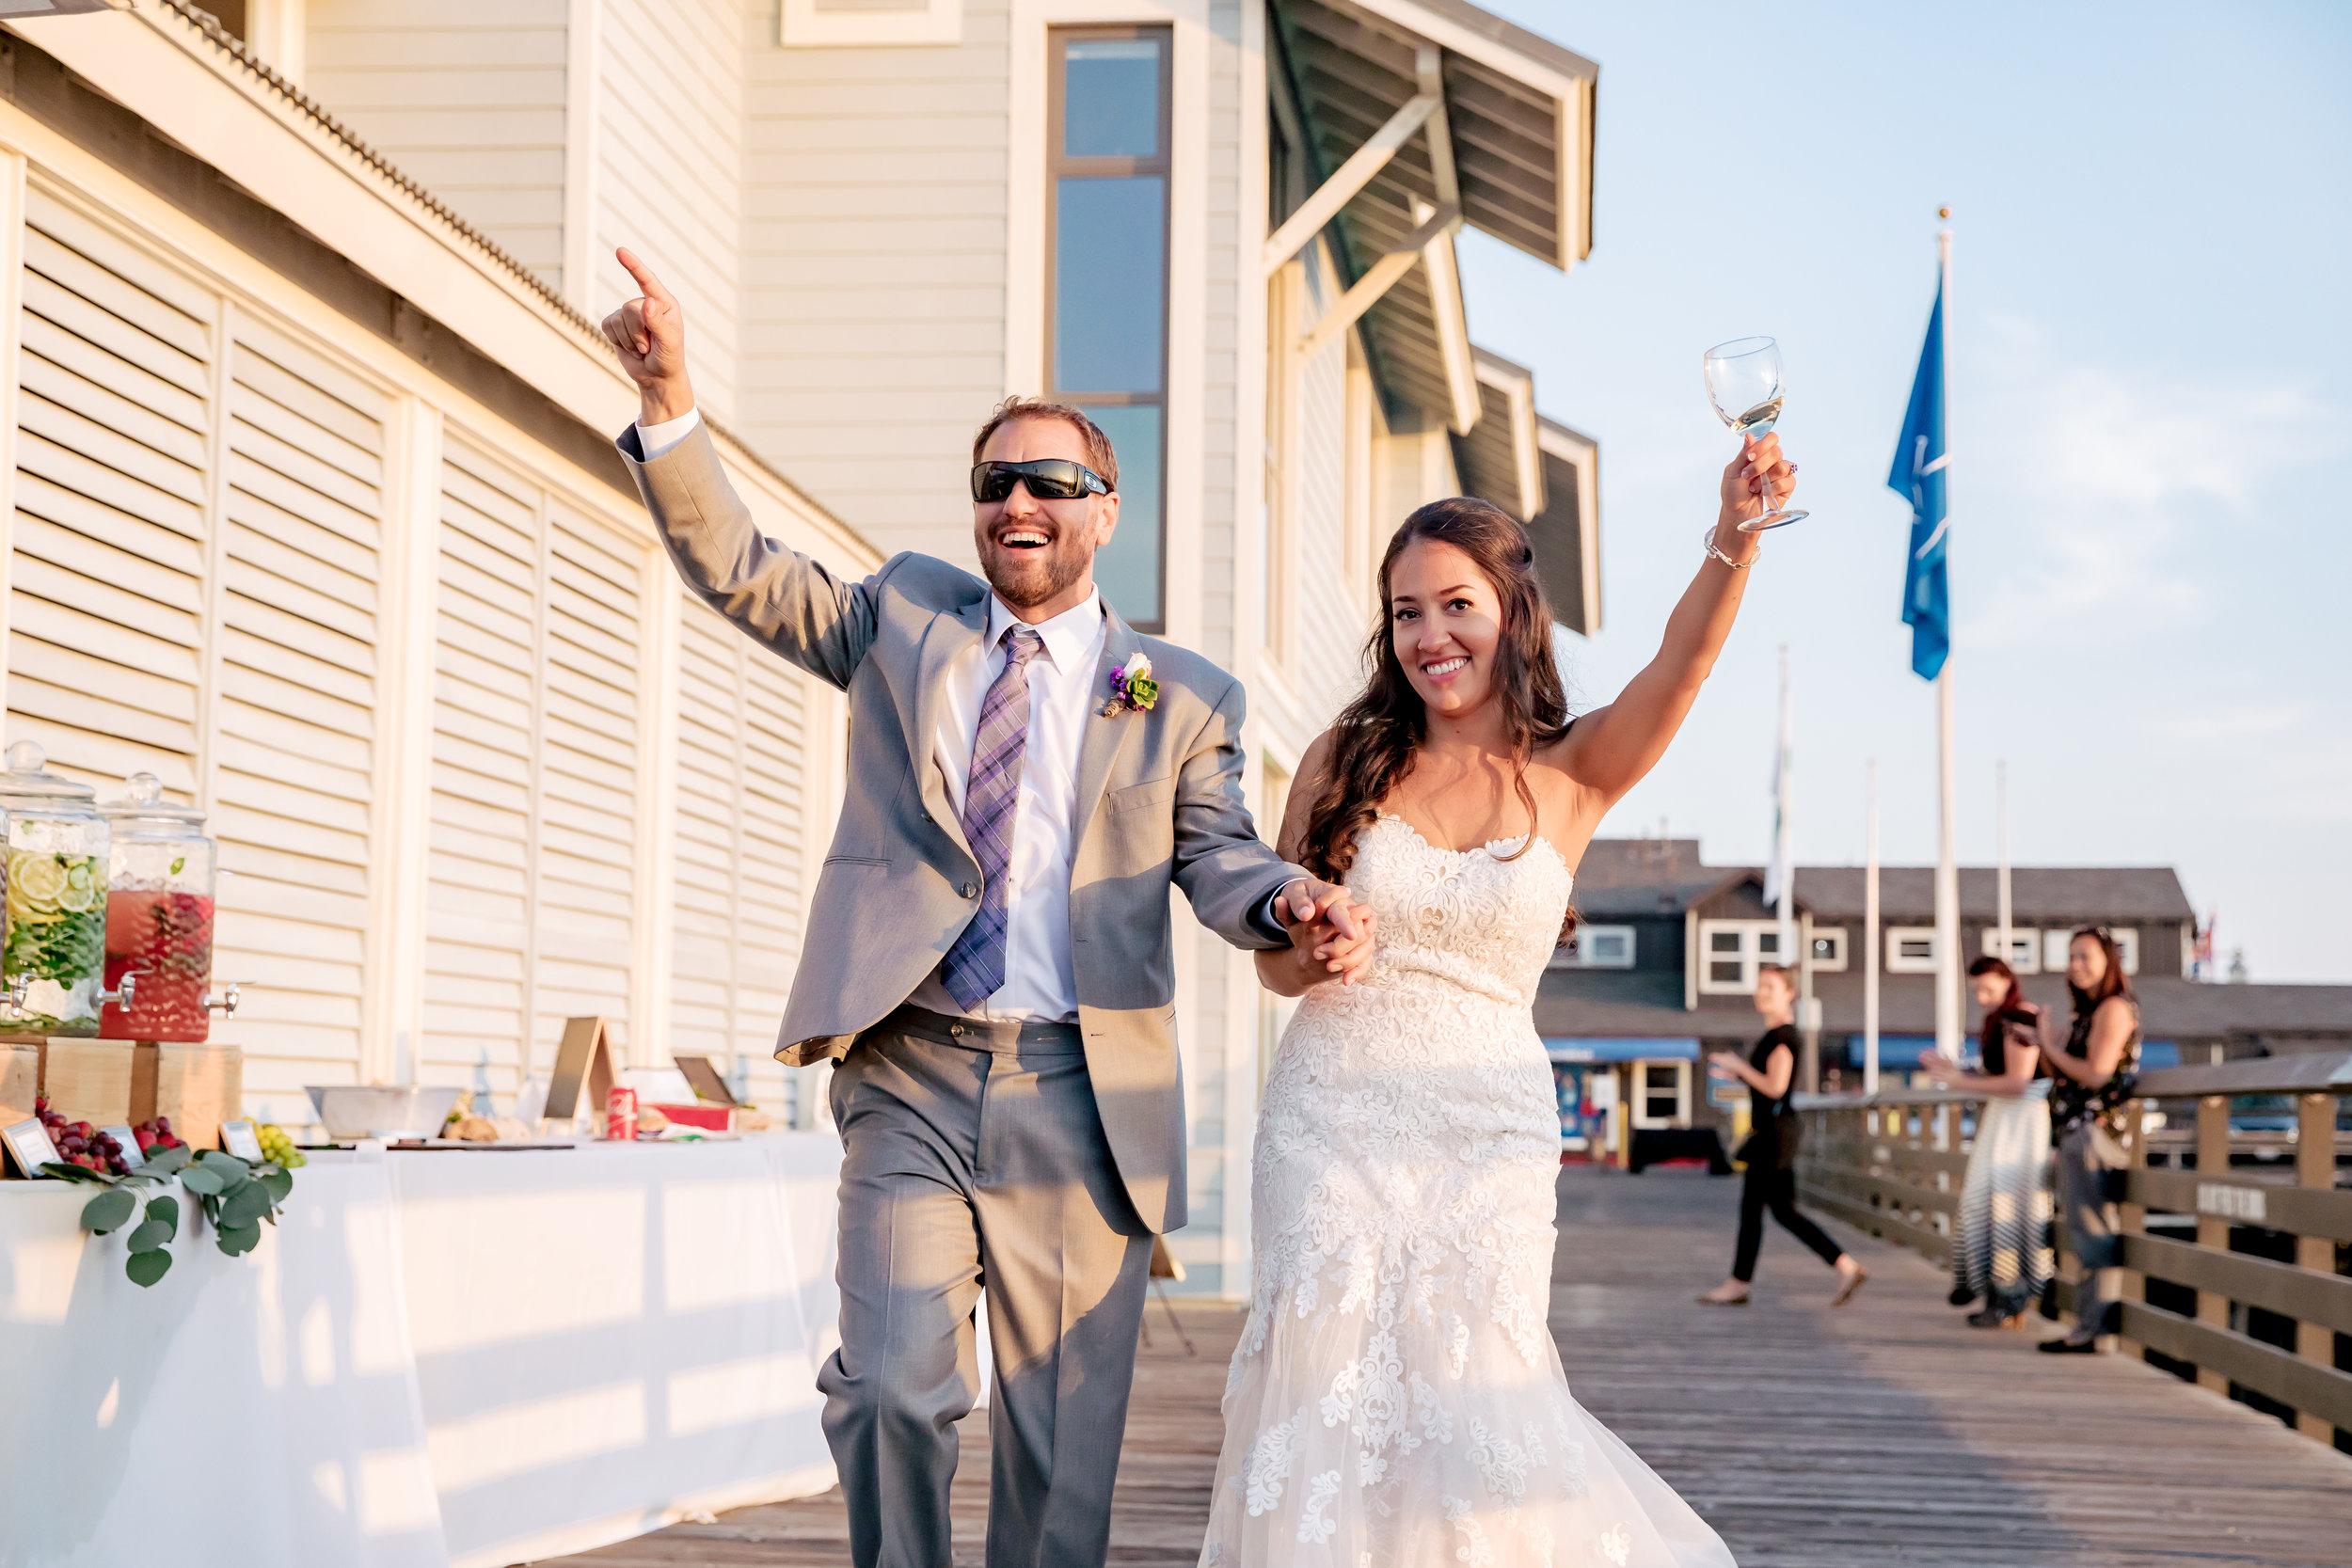 www.santabarbarawedding.com | Rewind Photography | Santa Barbara Sea Center | Bride and Groom